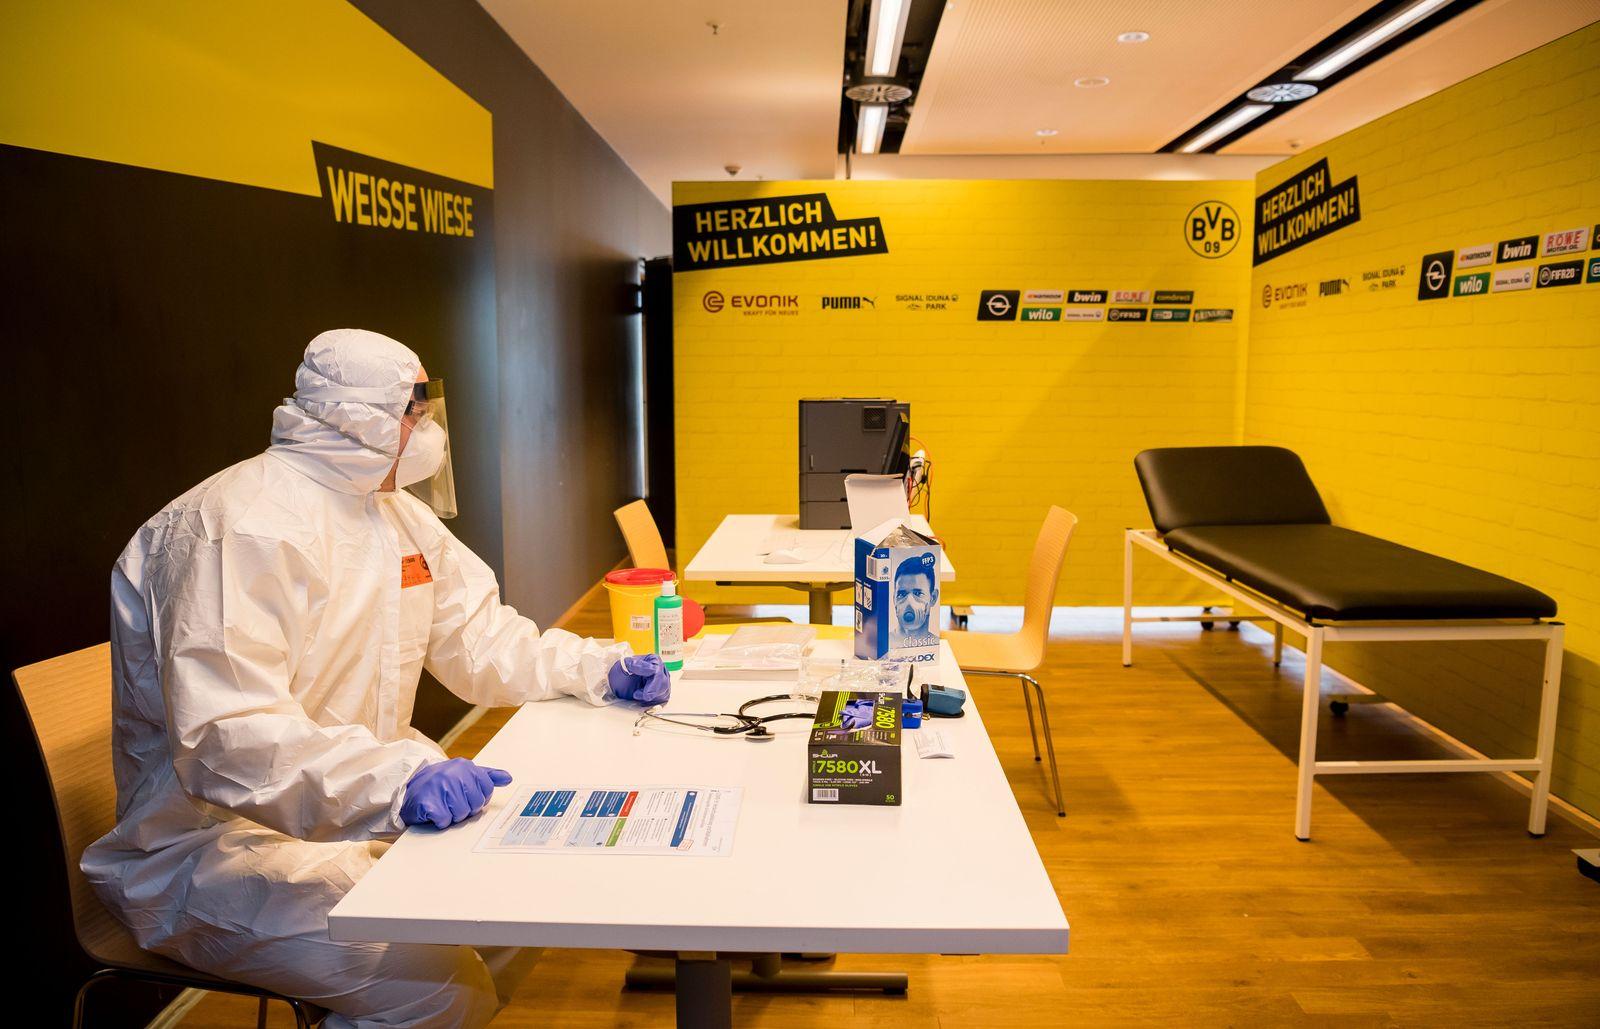 Westfalen Stadium to be turned into coronavirus treatment center, Dortmund, Germany - 03 Apr 2020